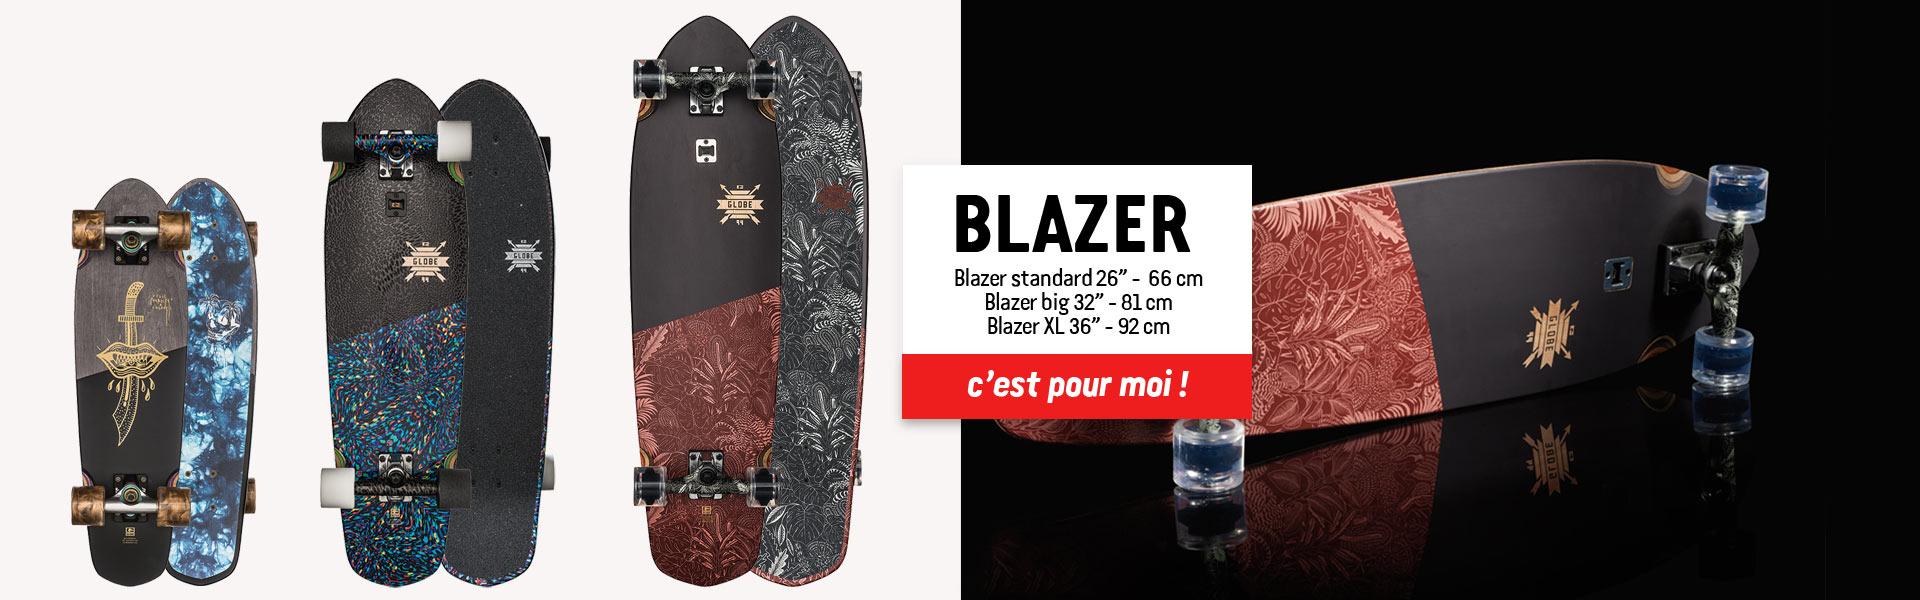 BLAZER skateboard globe